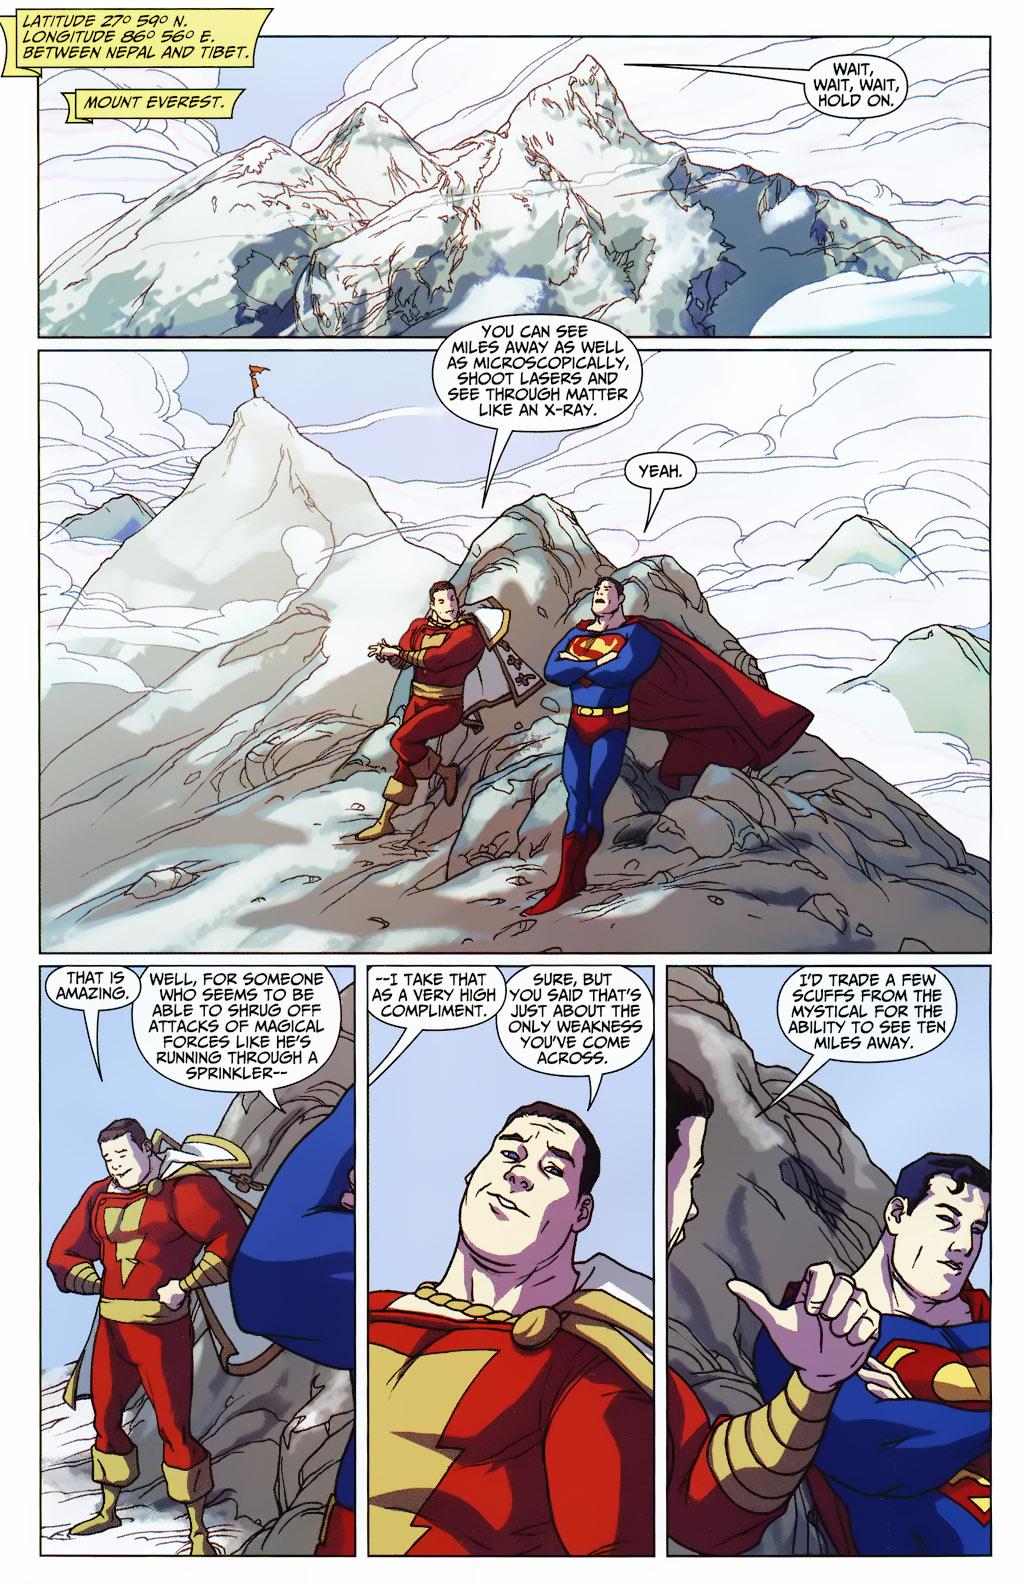 Superman And Captain Marvel Bonding At Mt. Everest